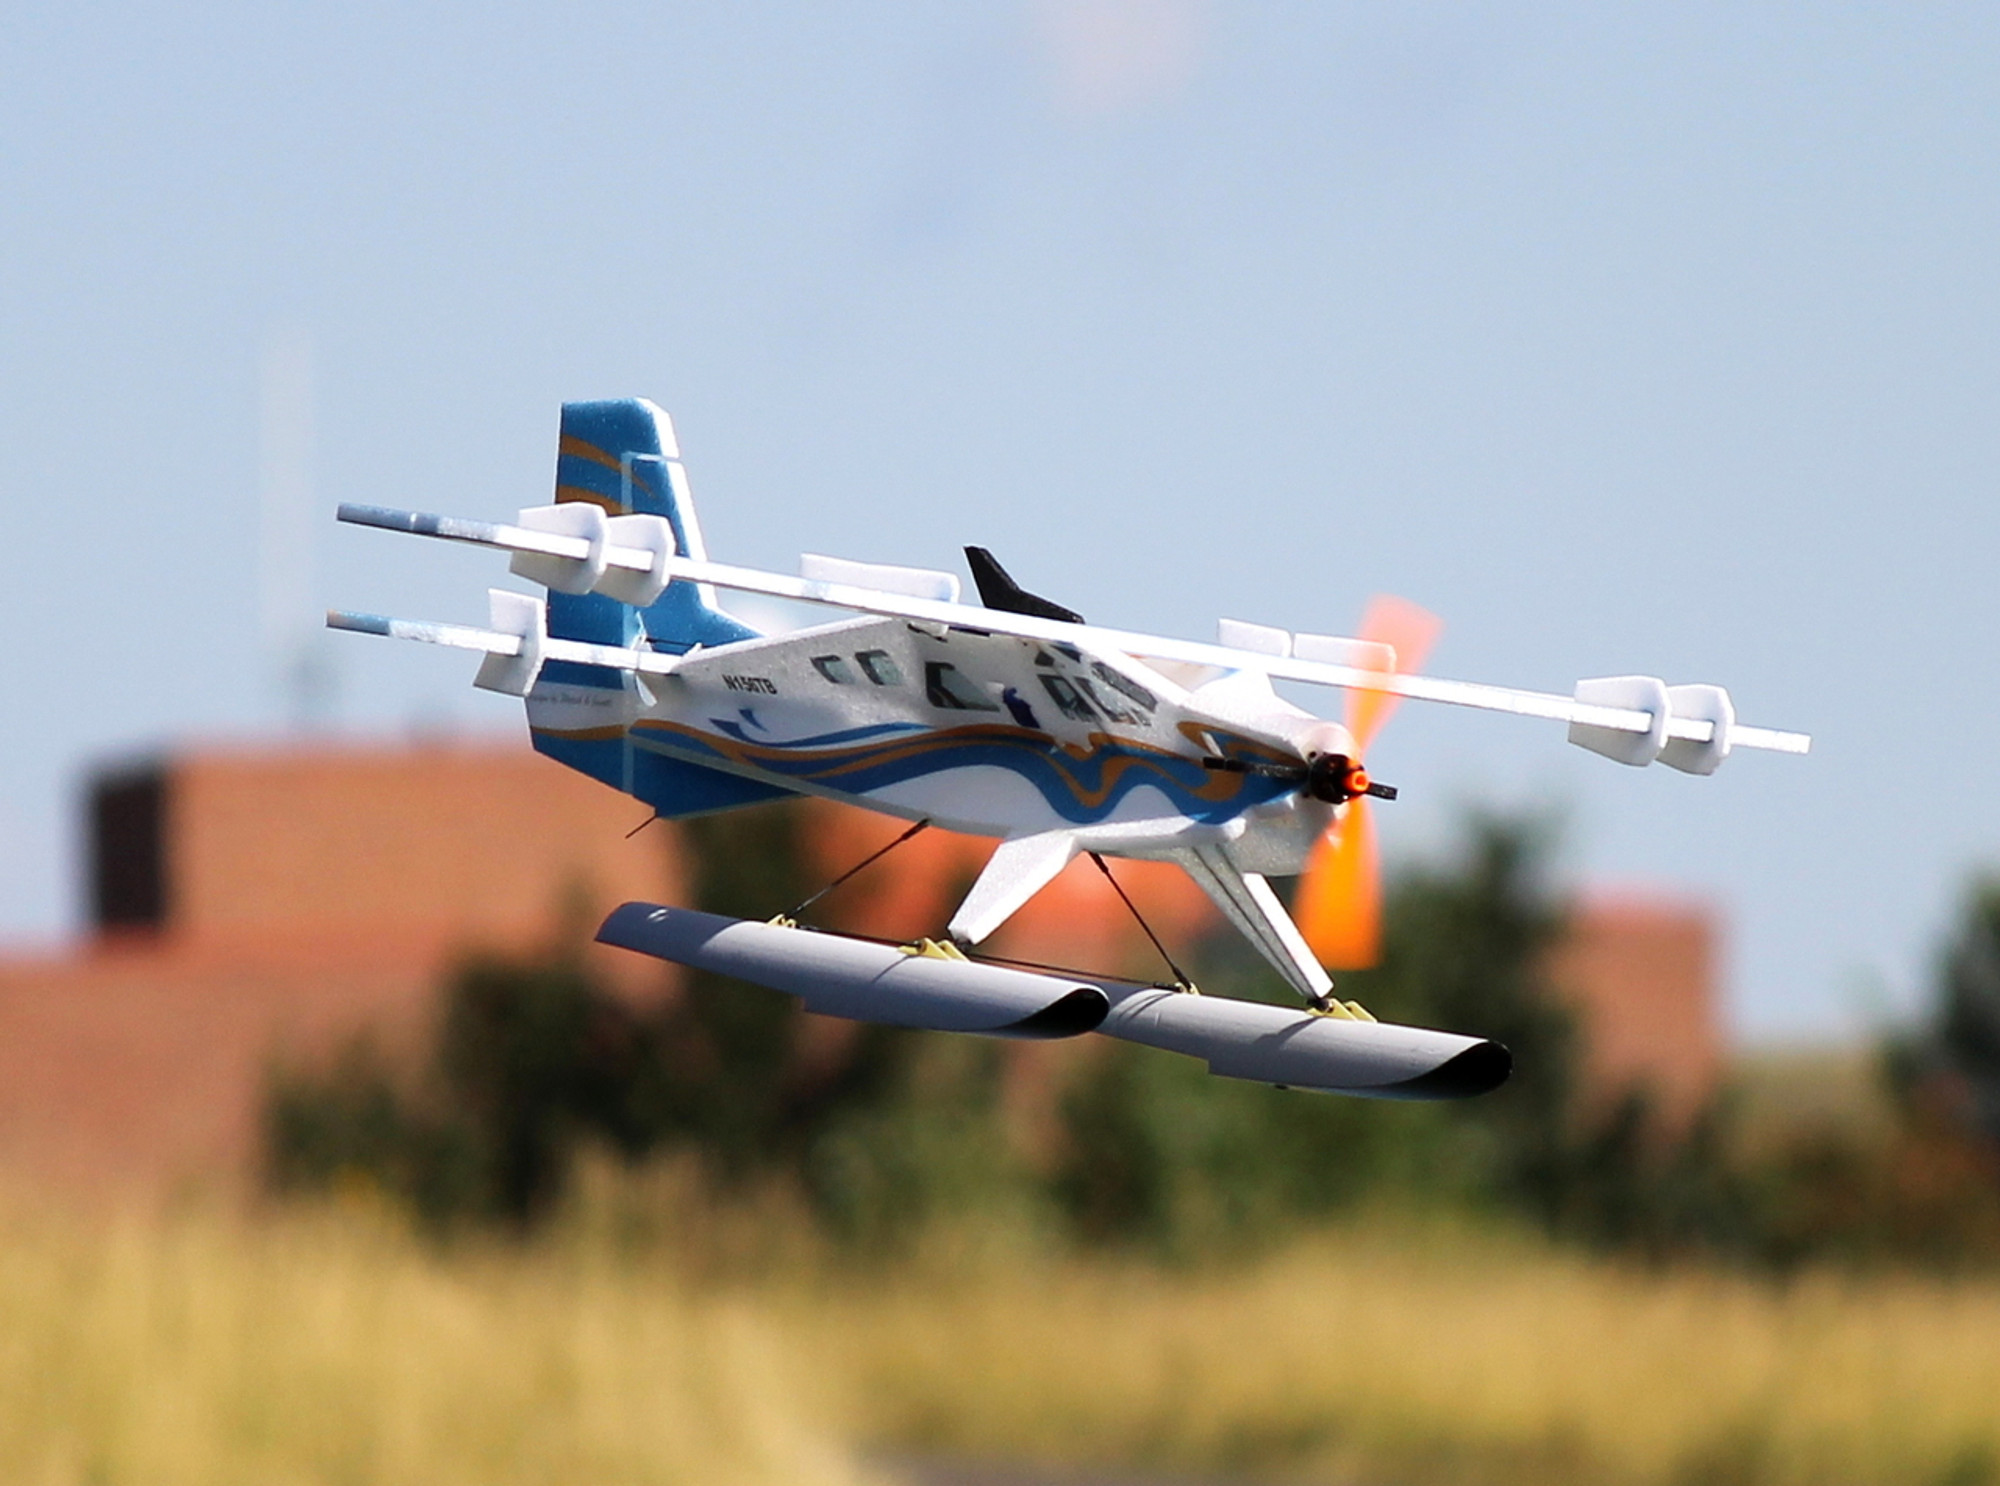 Twisted Hobbys 35 Quot Epp Crack Turbo Beaver Rc Foam 3d Plane